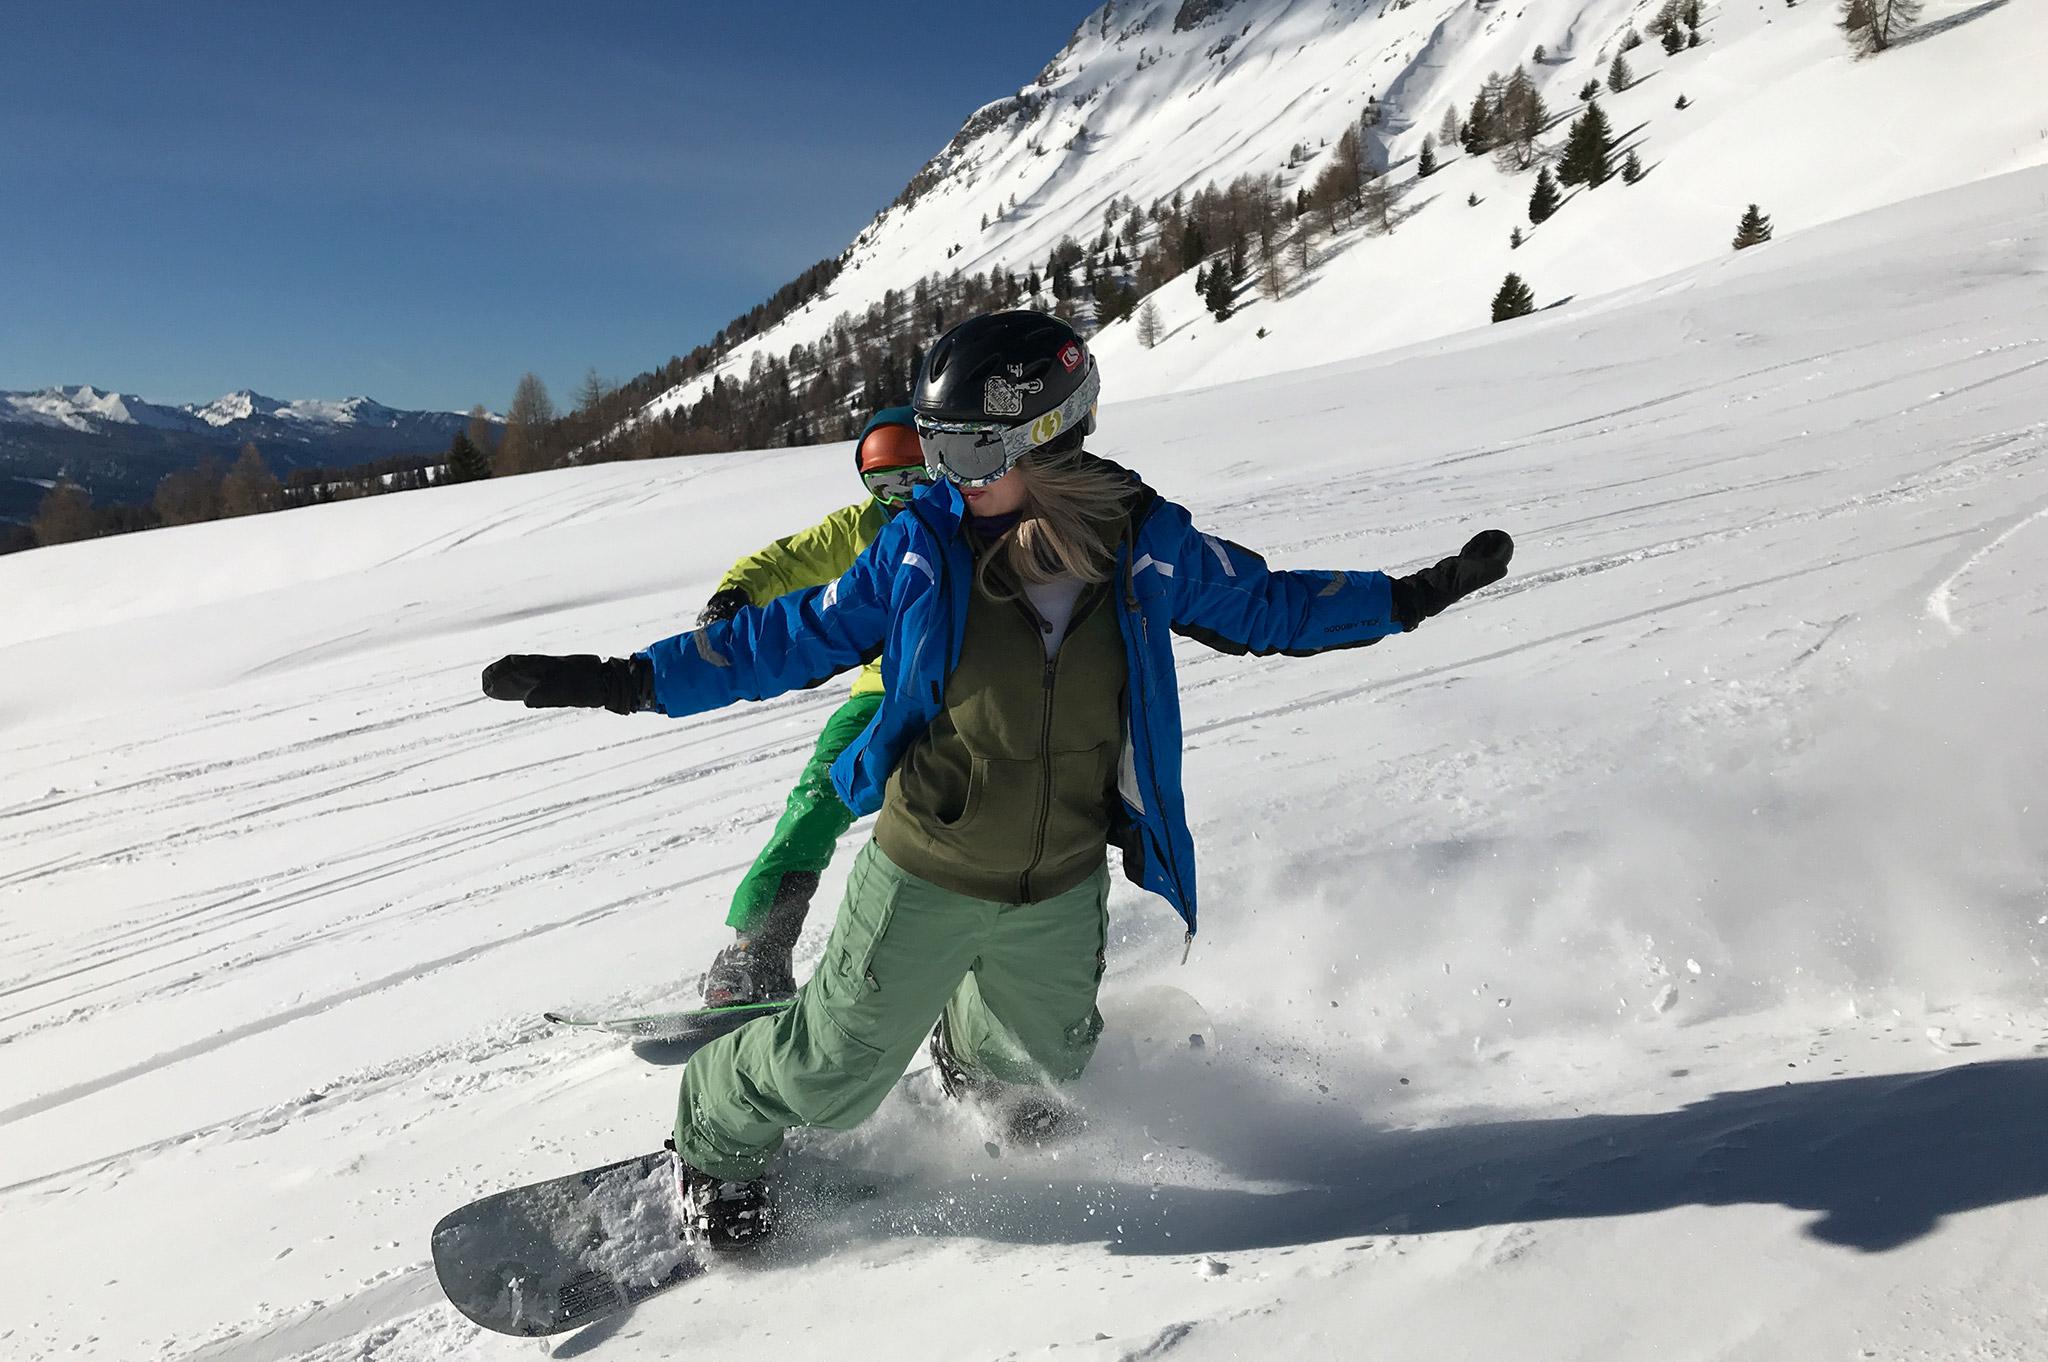 WŁOCHY – HAMAK SNOWBOARD CAMP – Val di Fiemme – 2020